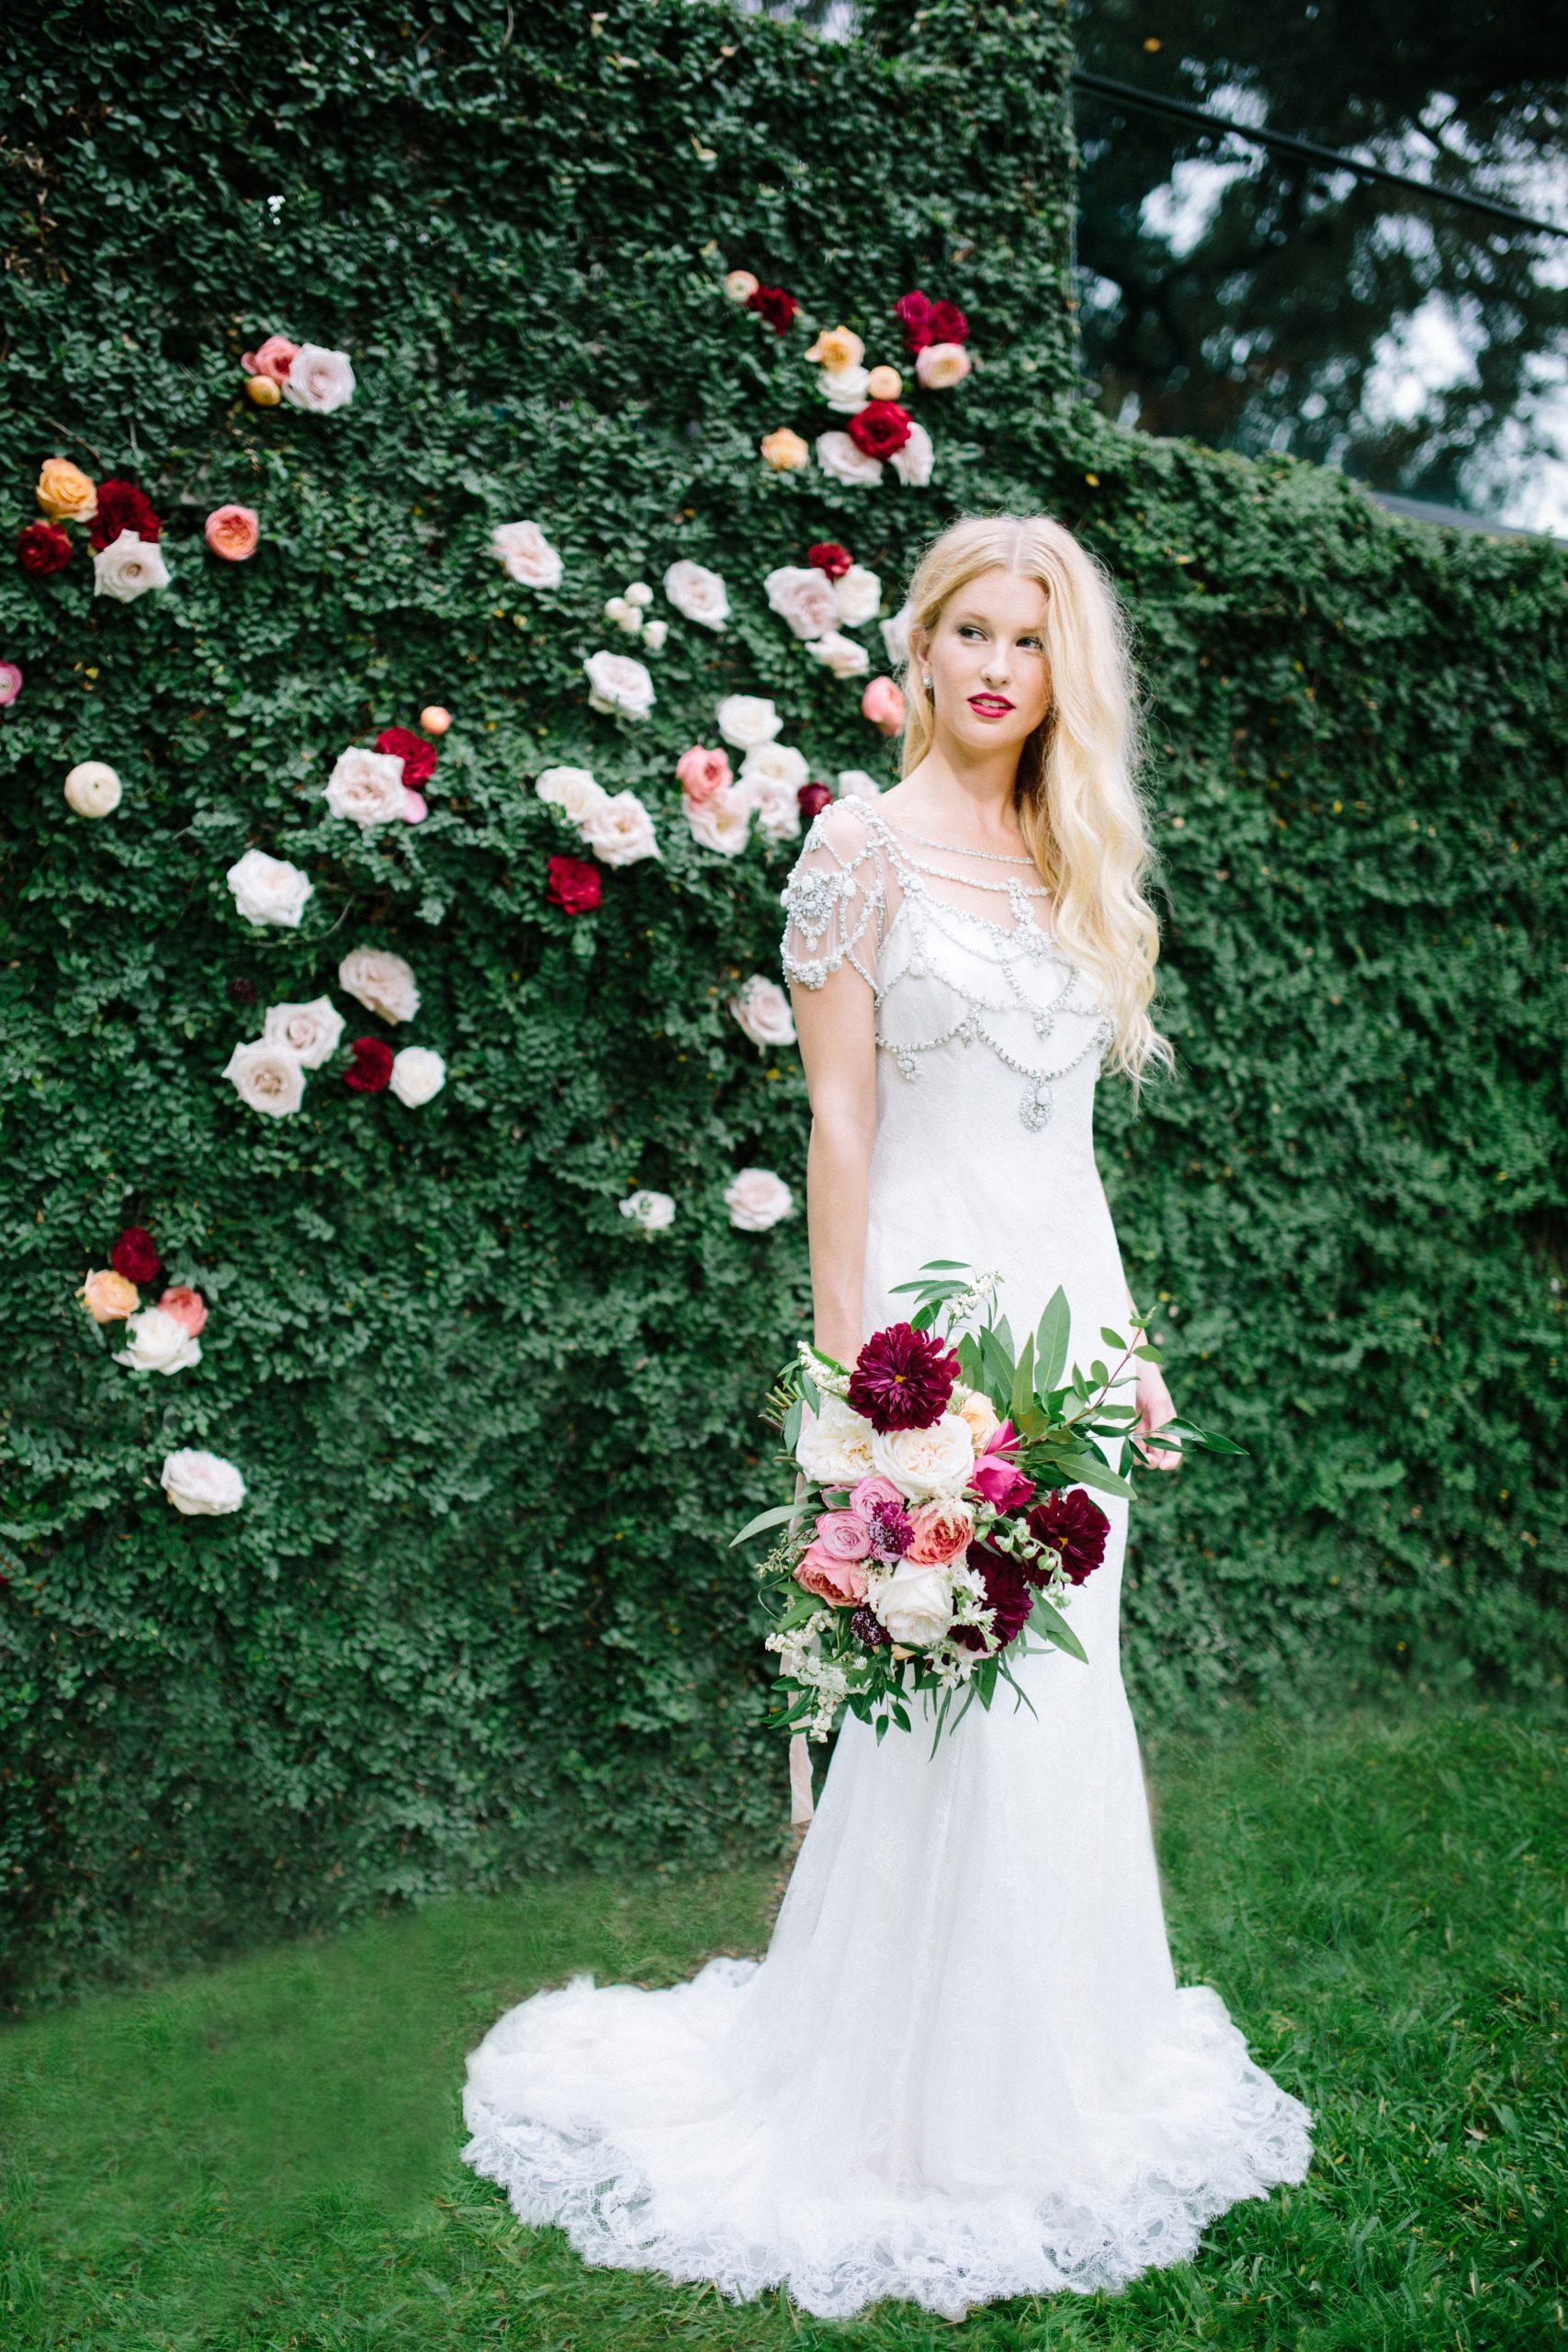 gownshoot_bridesofaustin_2015-13-copy-edit